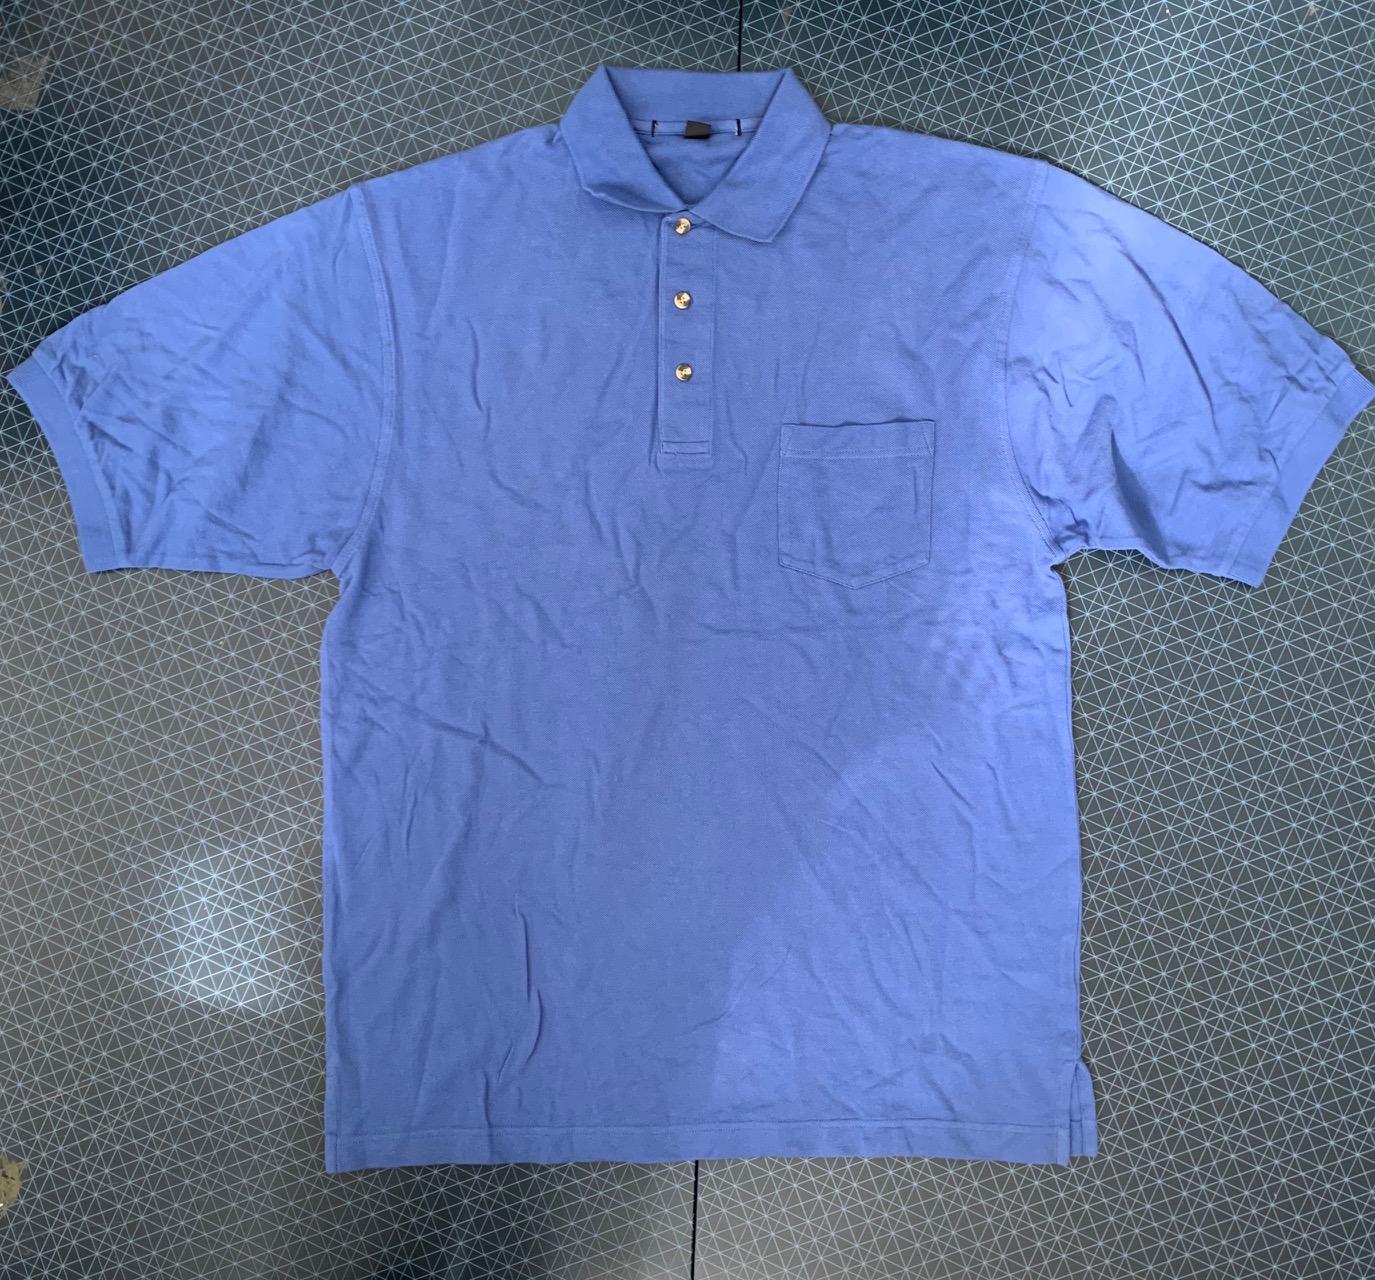 Мужская голубая футболка от Port Authority